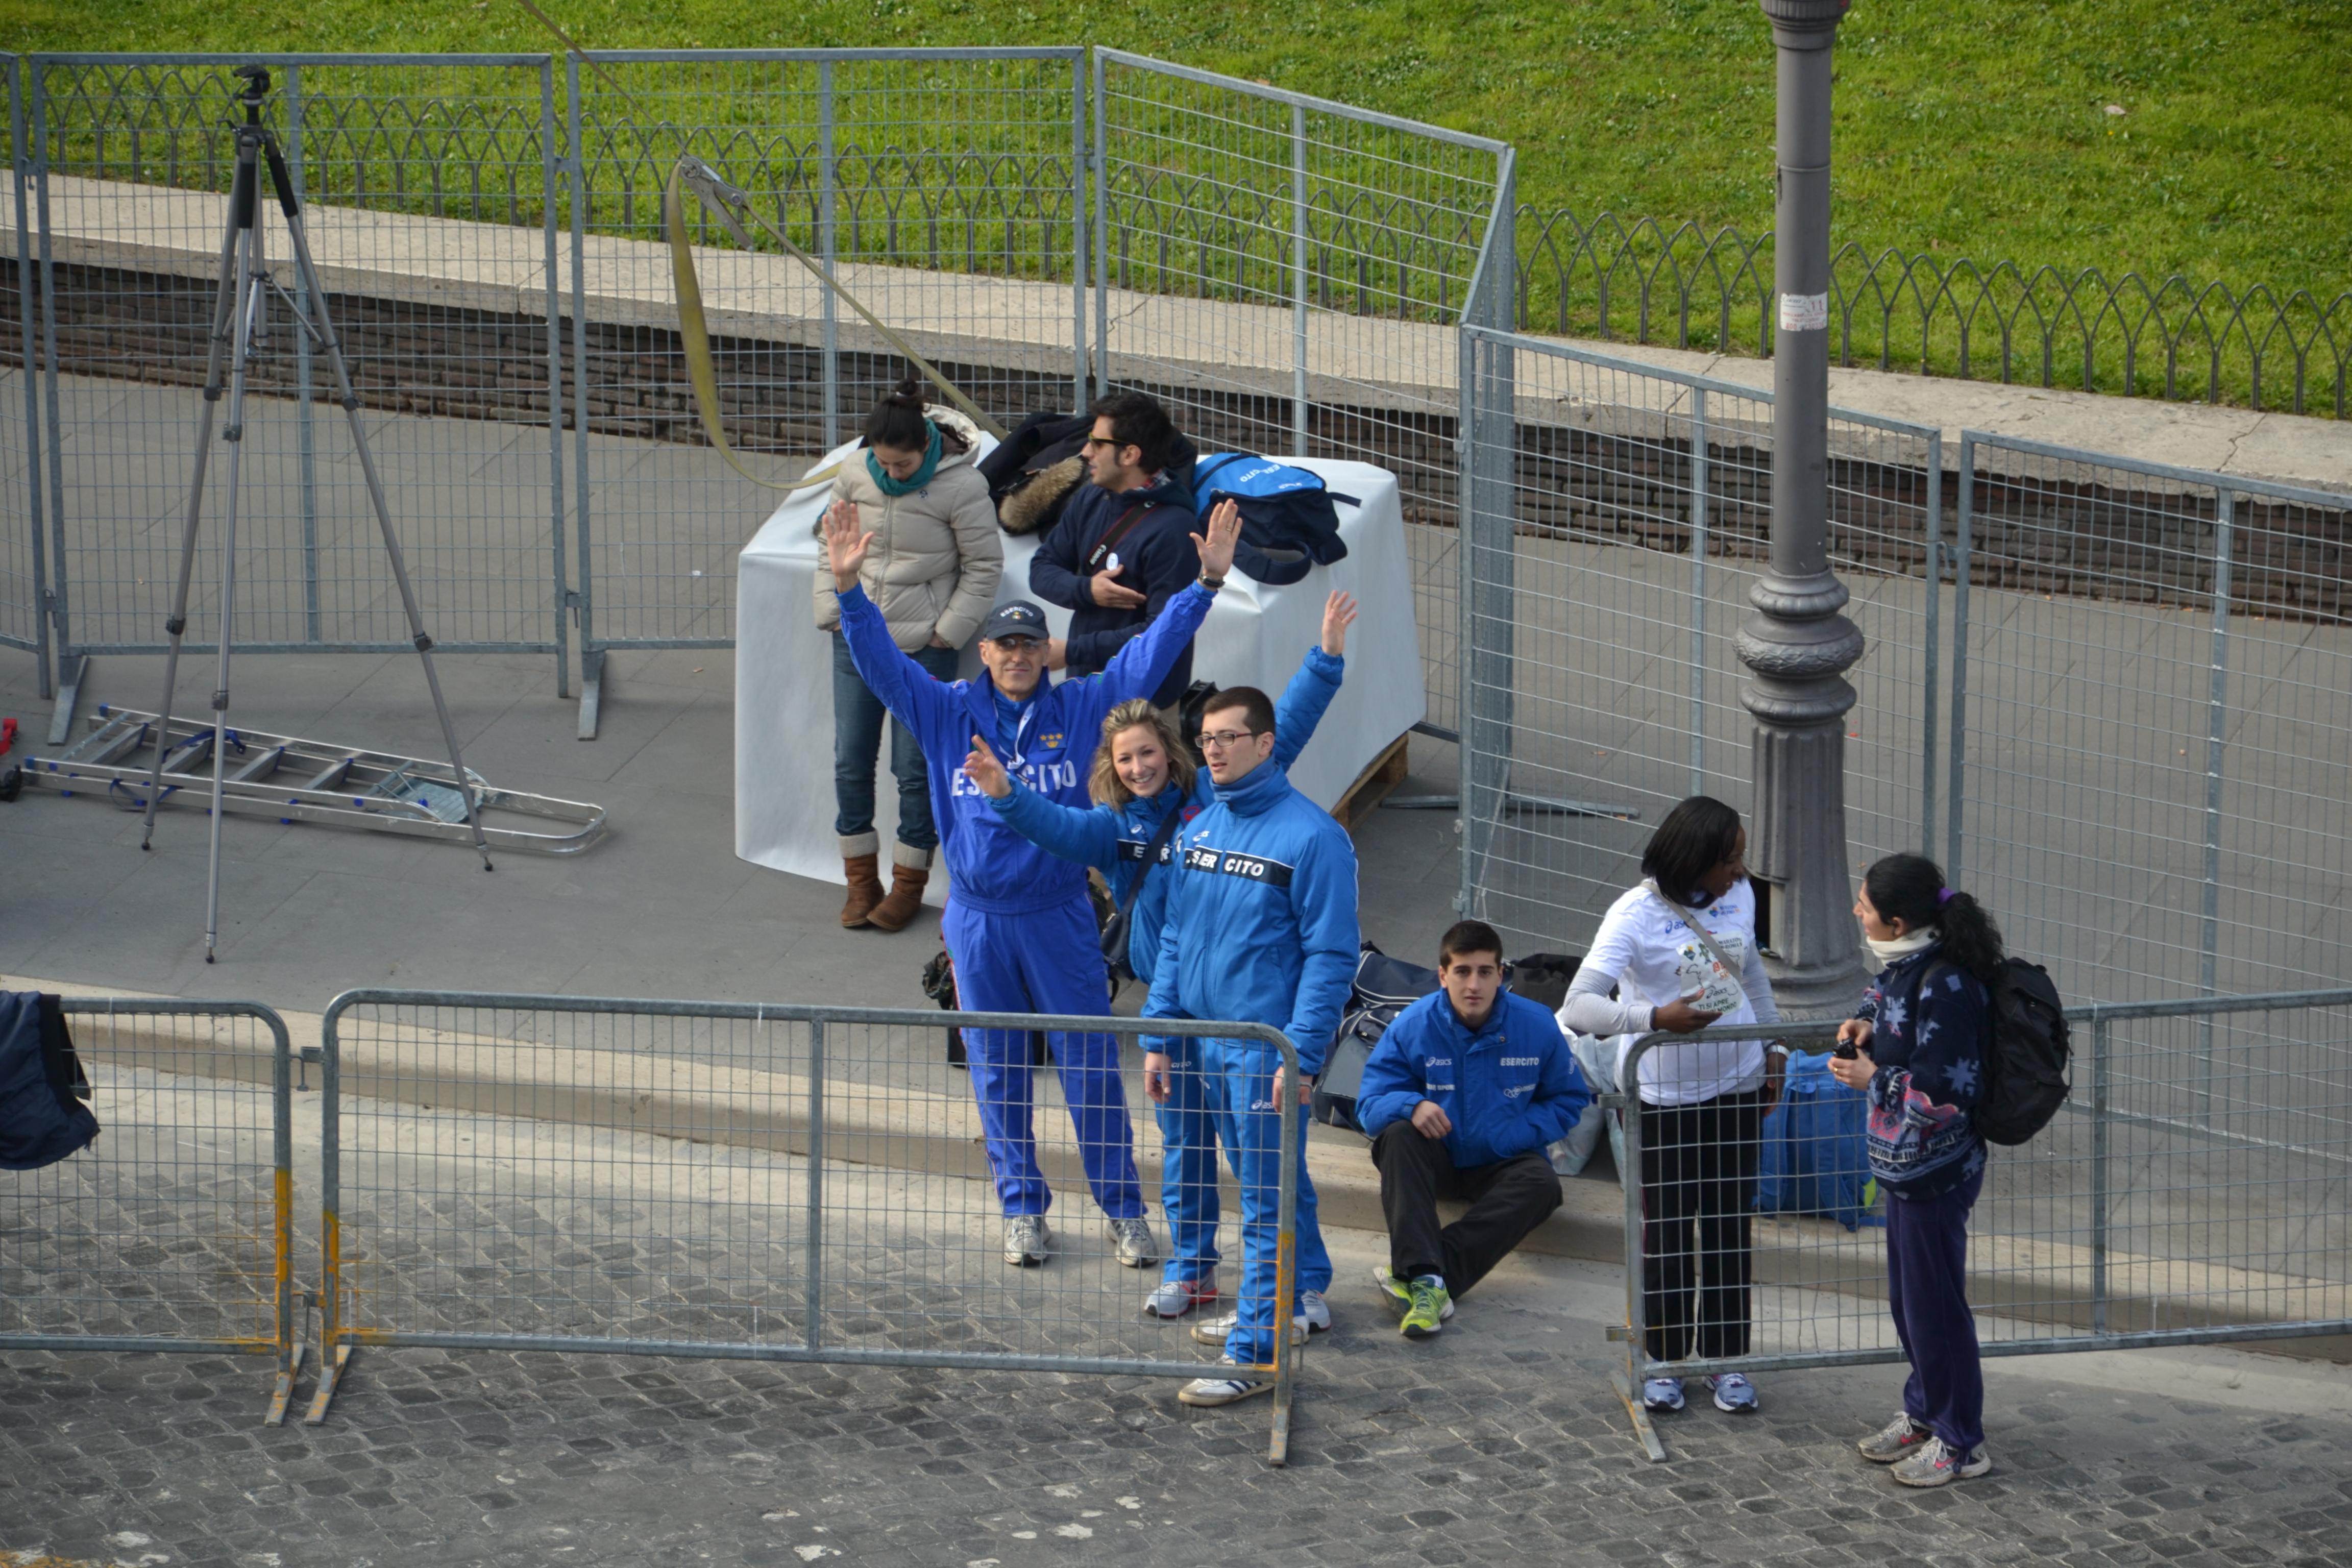 maratona-di-roma-2013-118